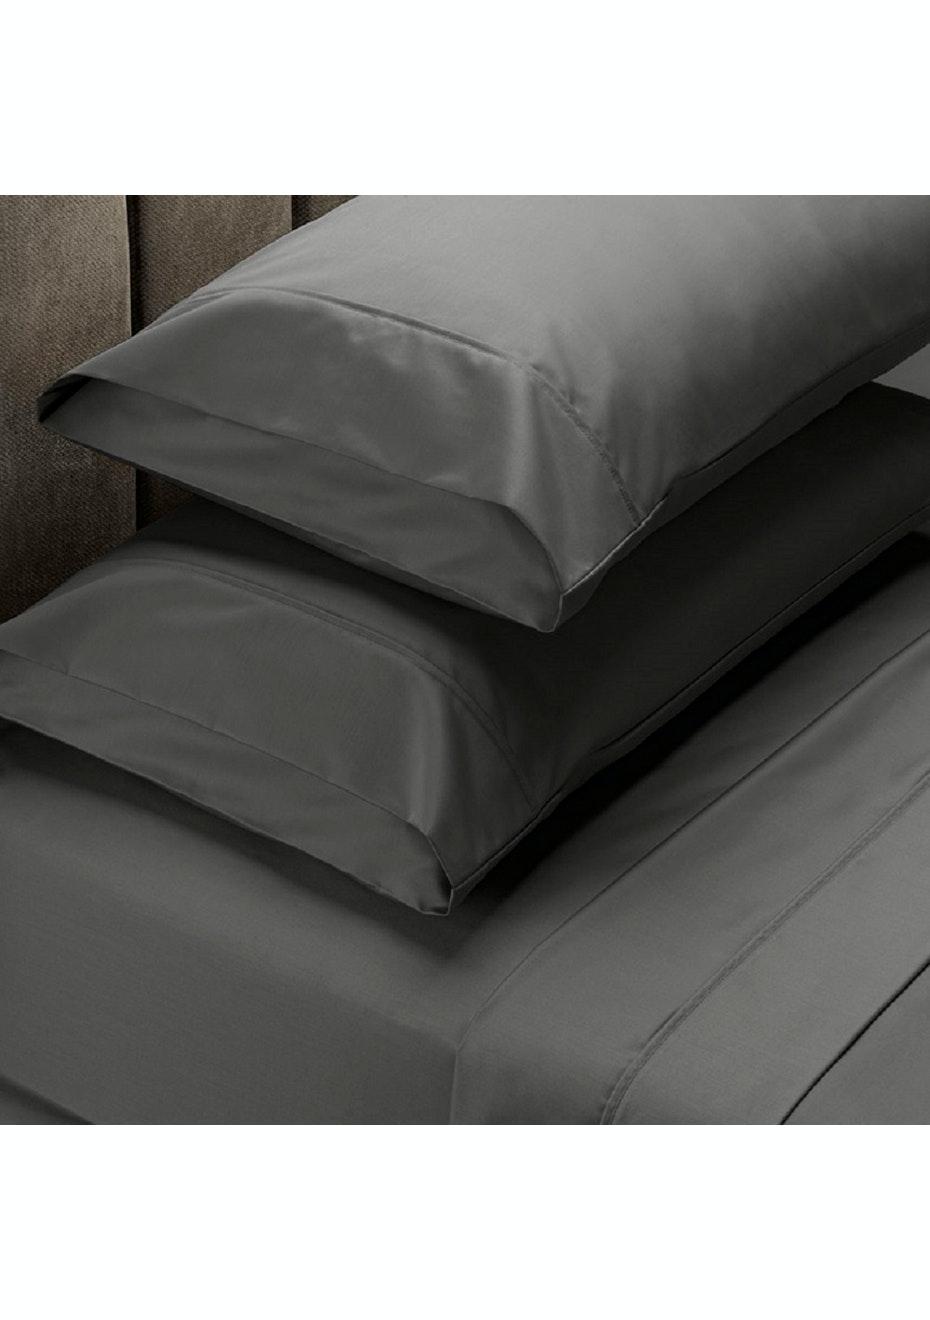 Park Avenue 1000 Thread Count 100% Egyptian Cotton Sheet Sets Mega King - Granite